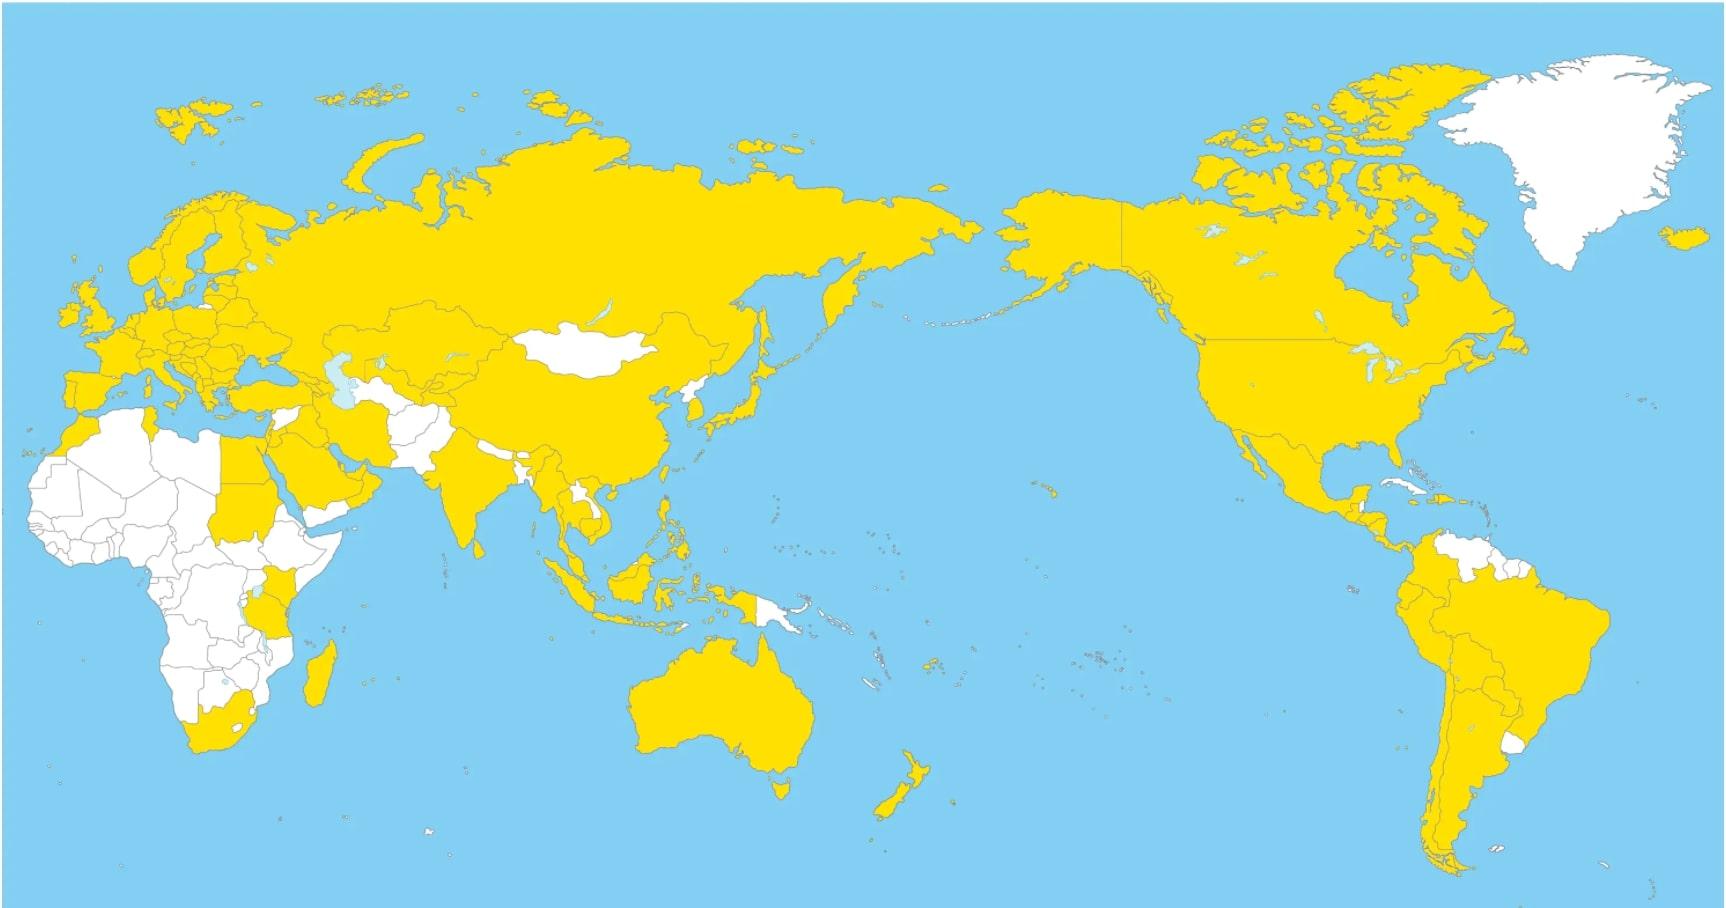 POCKETALK(ポケトーク)のグローバル通信とは?